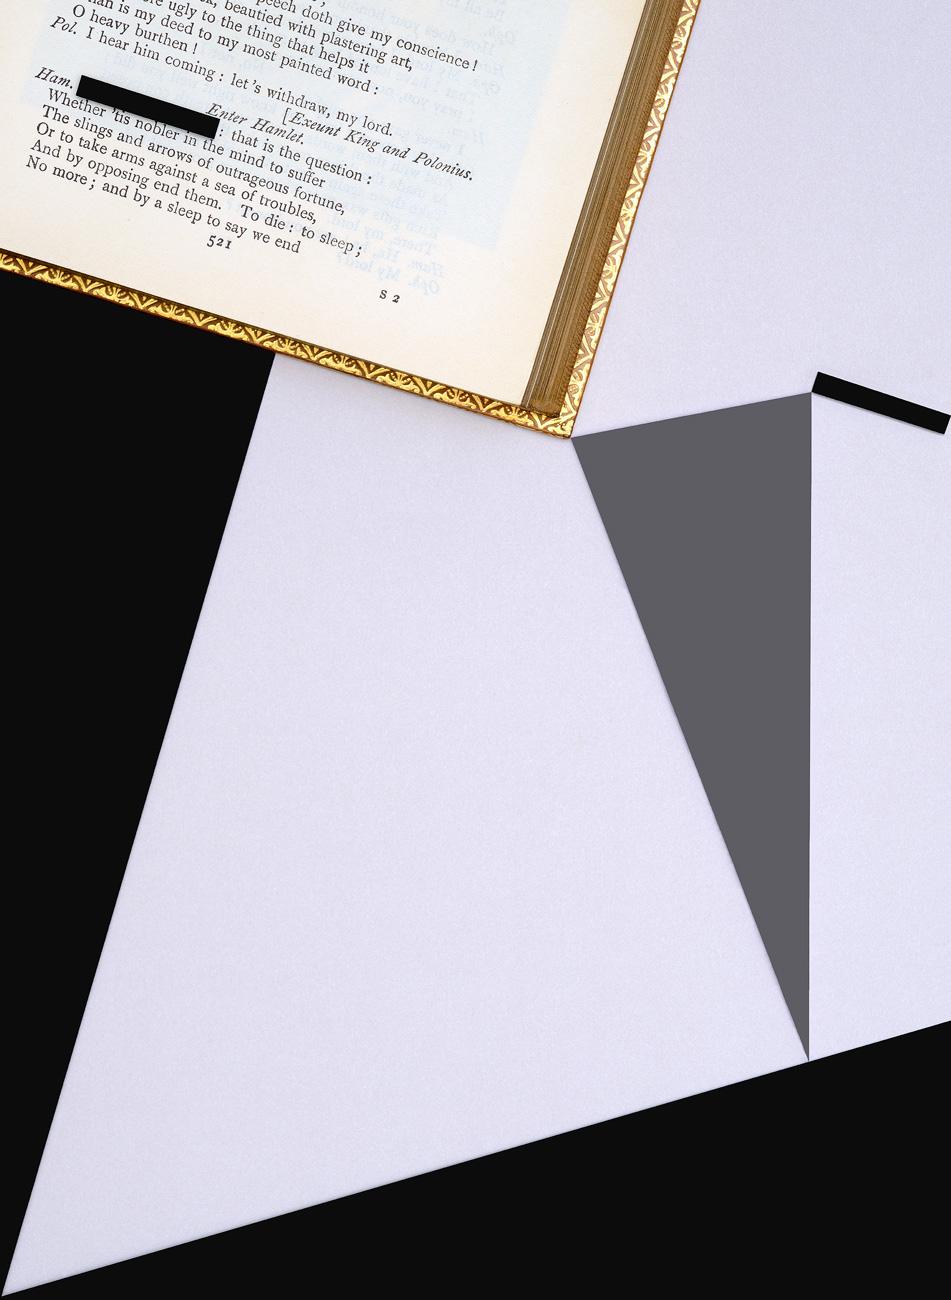 Gauthier d'Ydewalle | Shakespeare | Fotografia C-Print em metacrilato | 109 x 80 cm | 2015